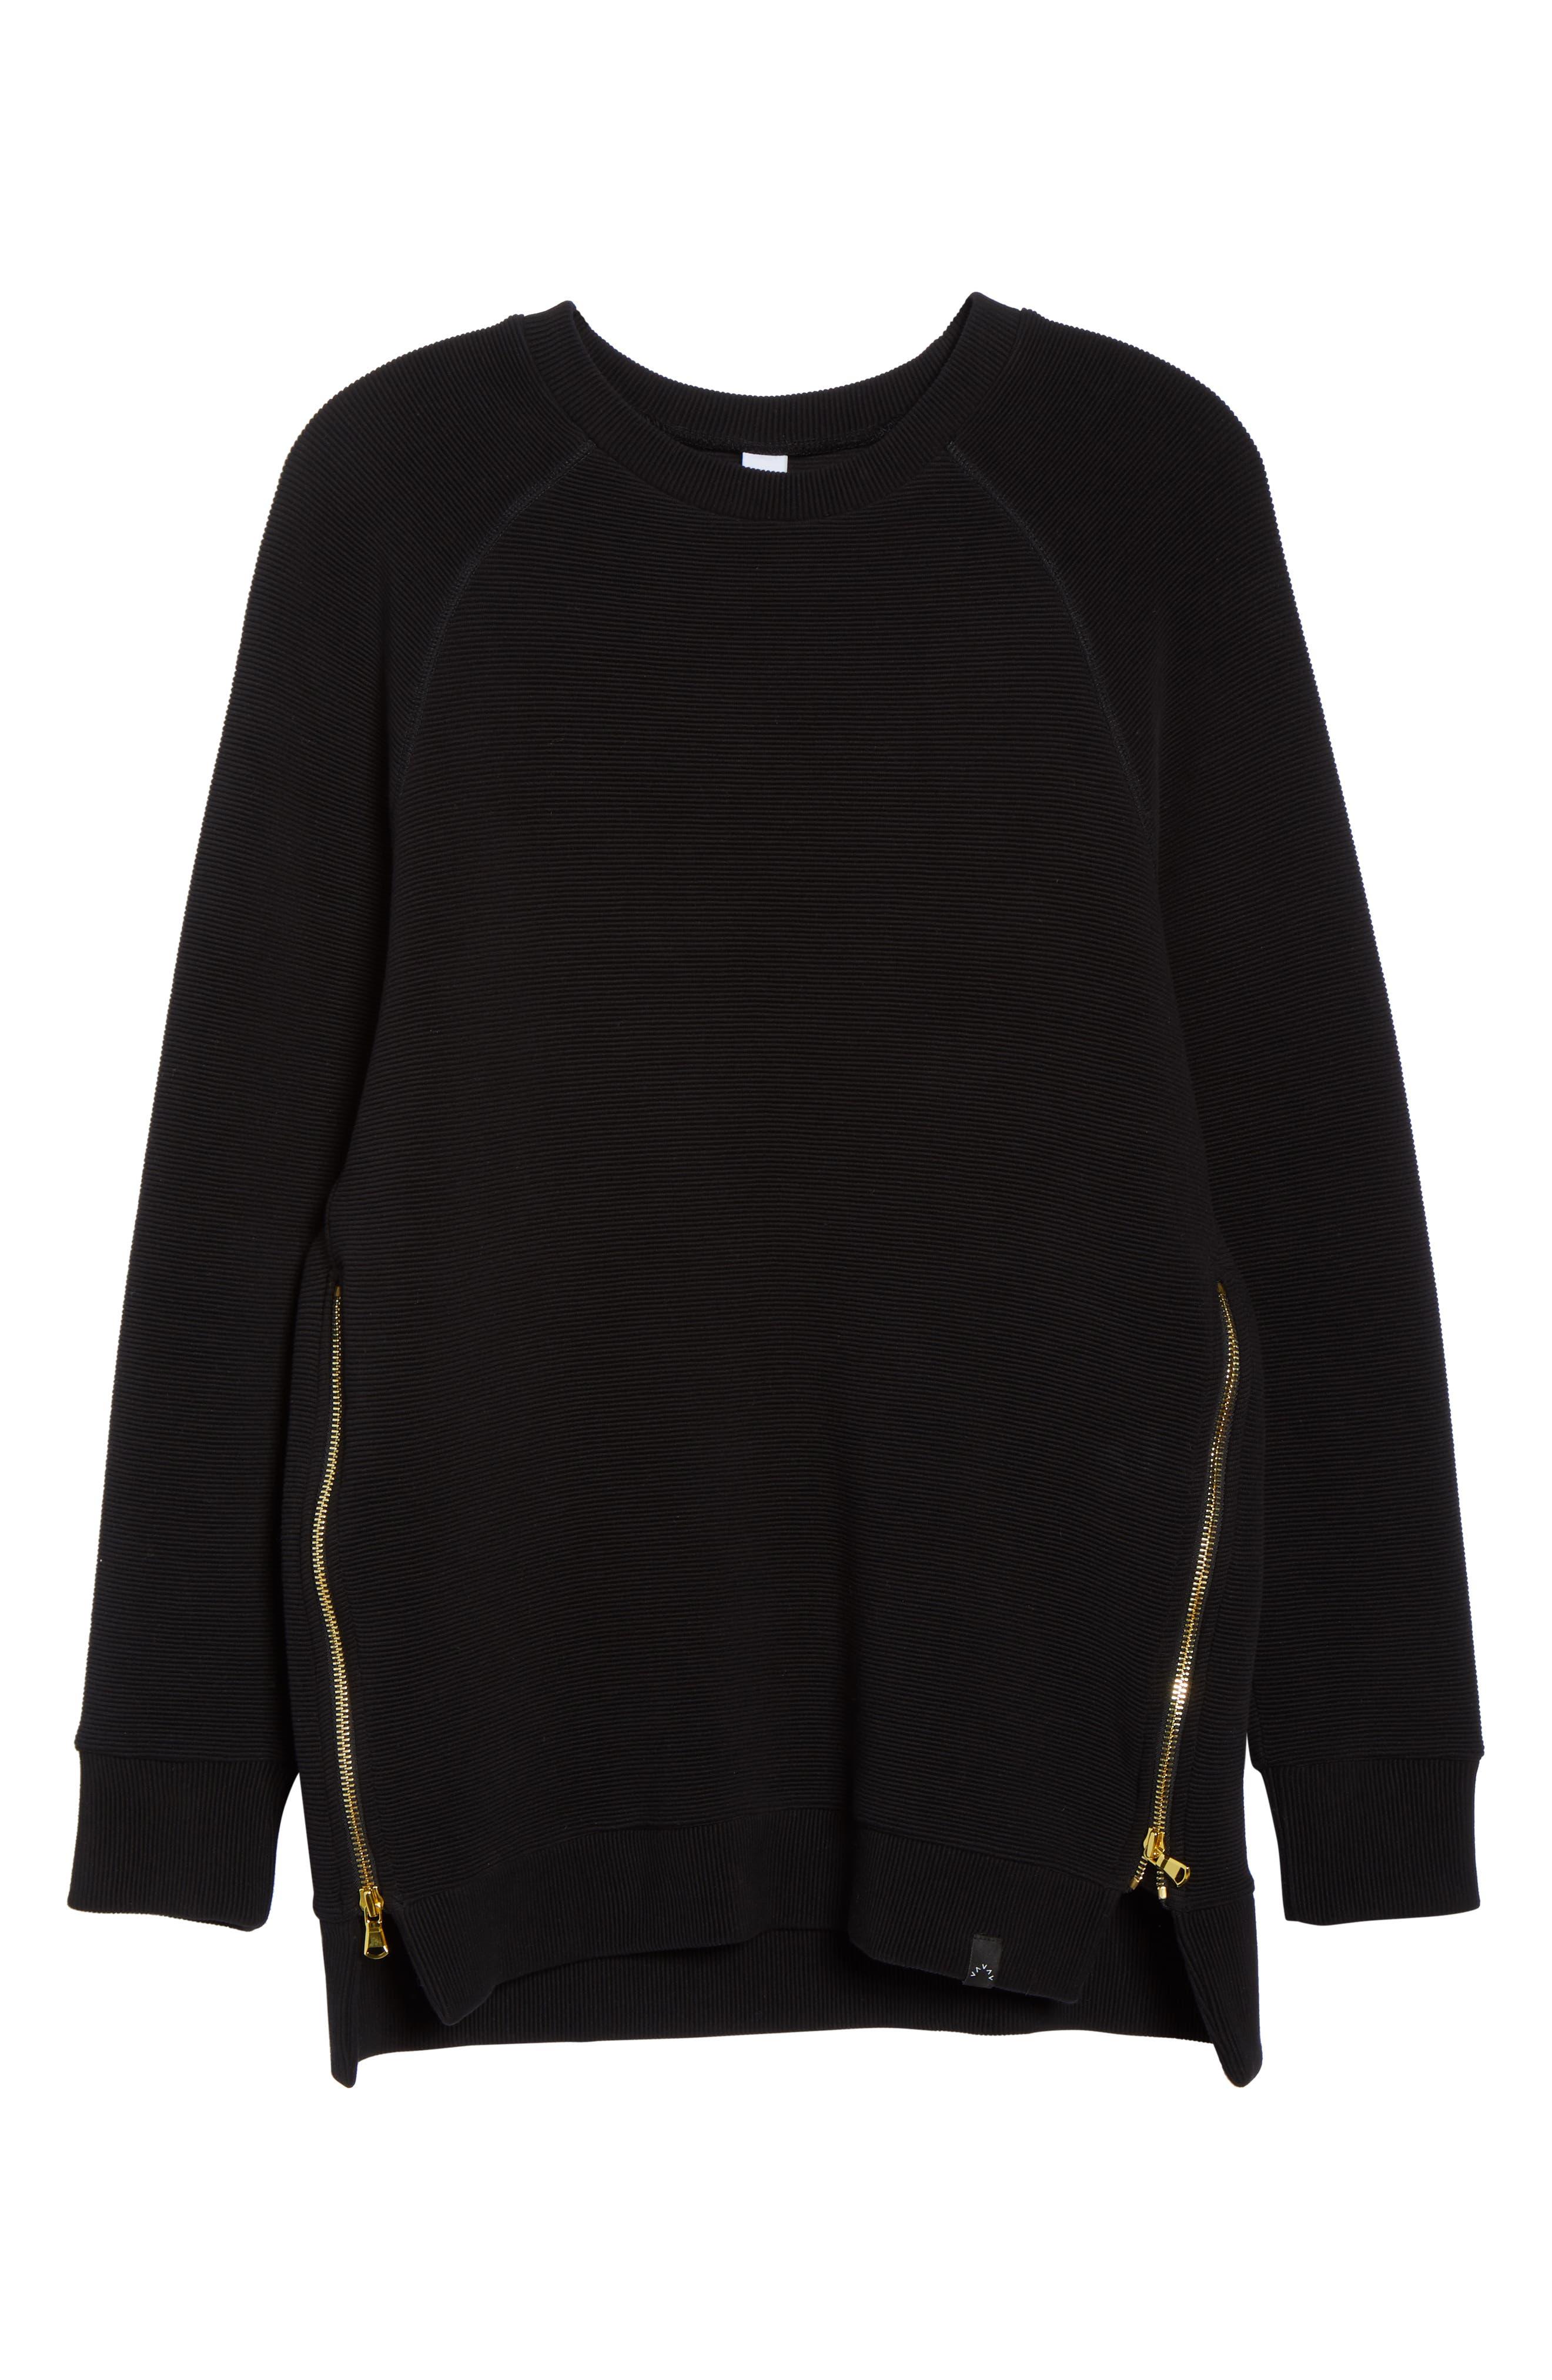 Manning Sweatshirt,                             Alternate thumbnail 7, color,                             BLACK RIB